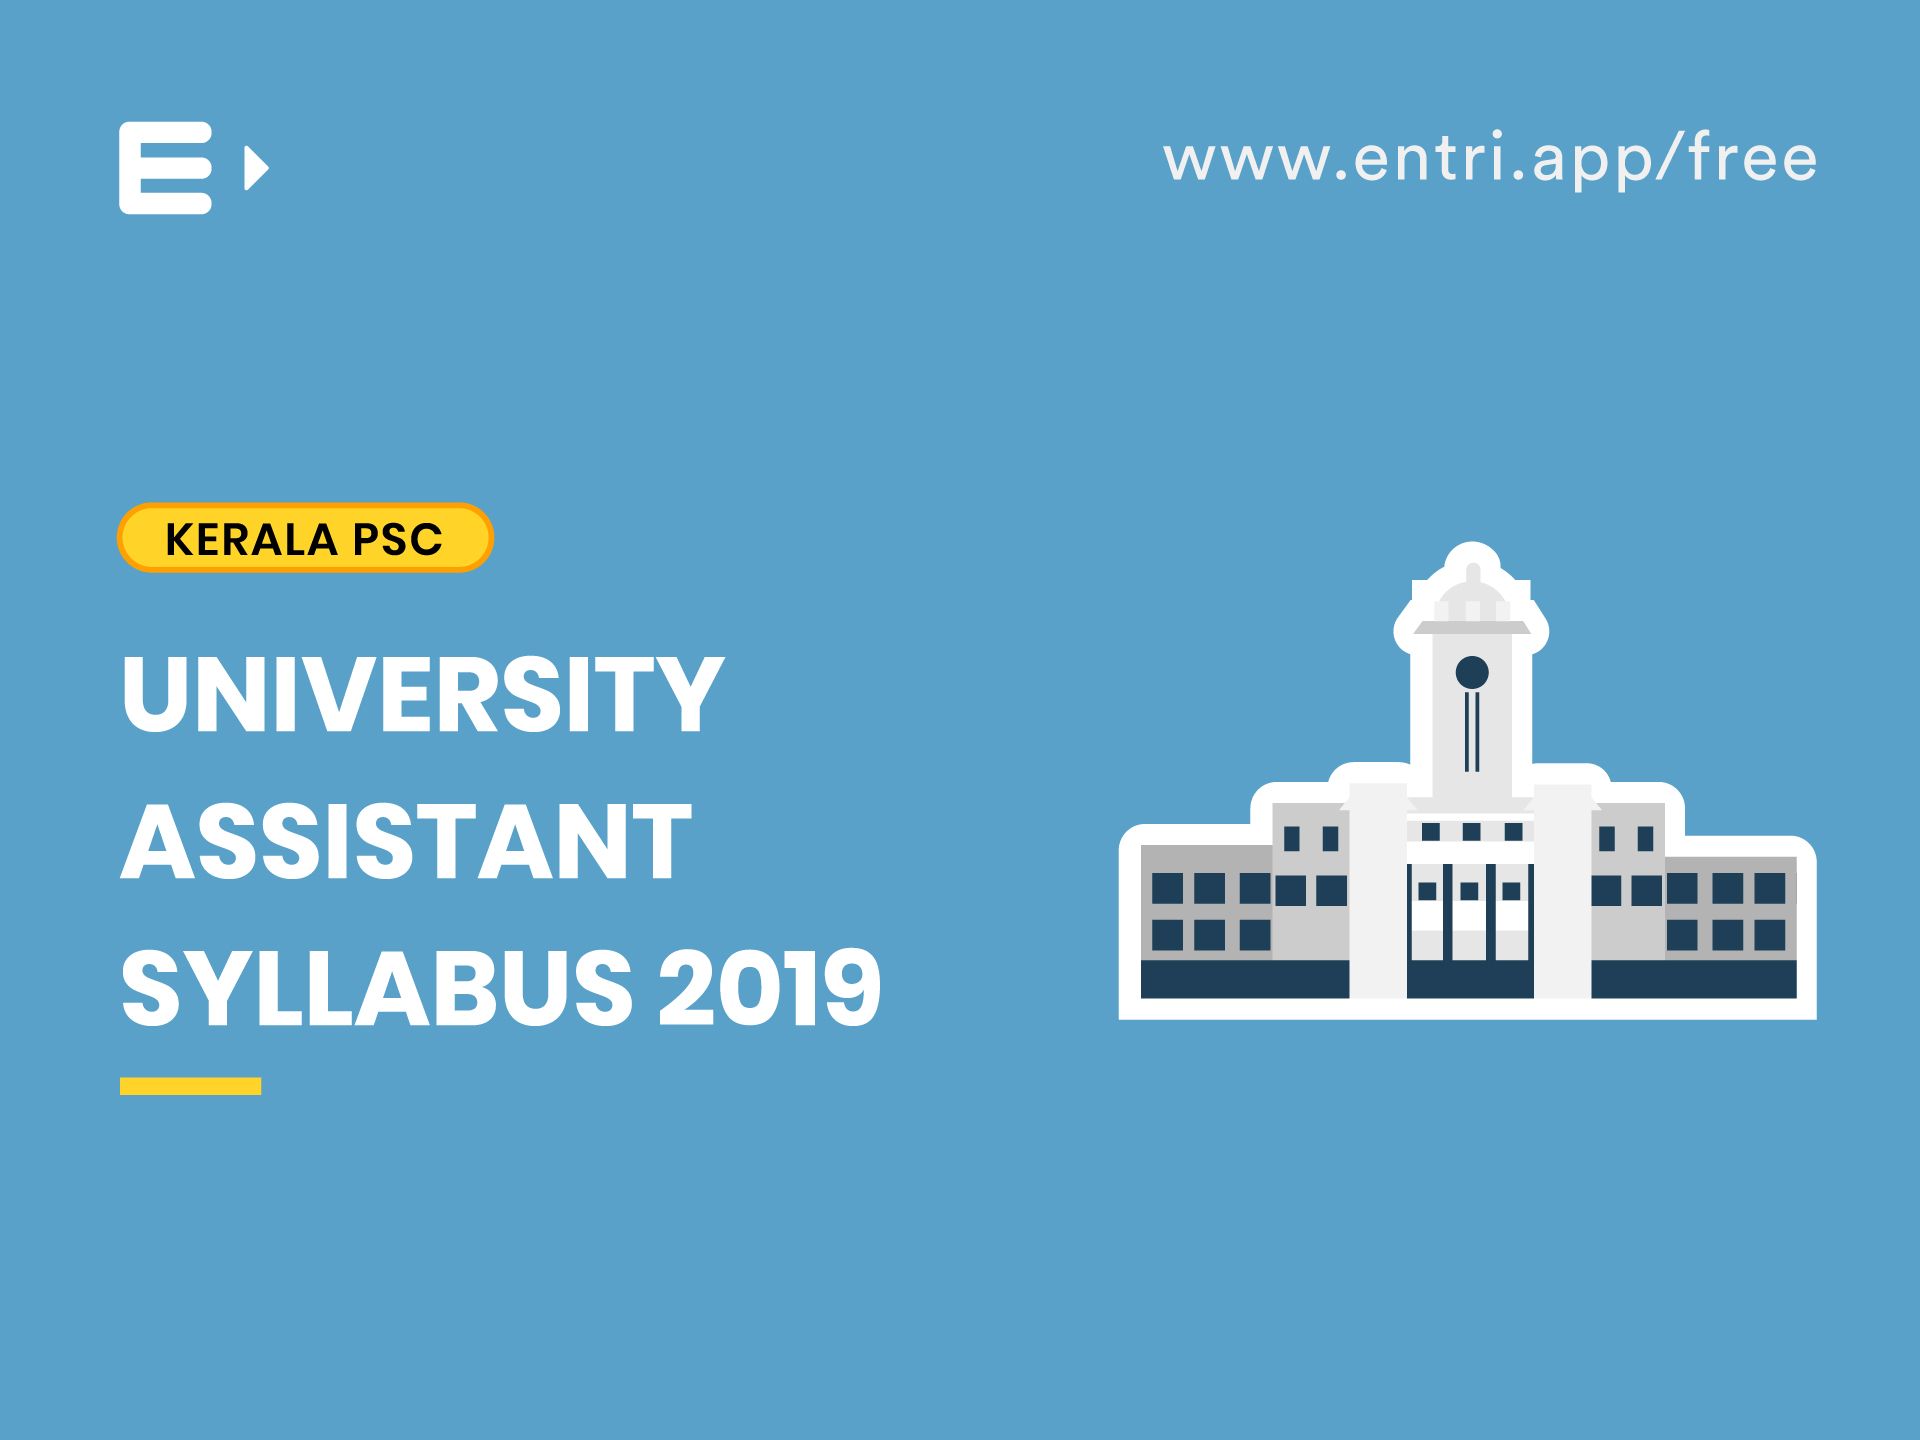 University Assistant Syllabus 2019 - Kerala PSC - Entri Blog